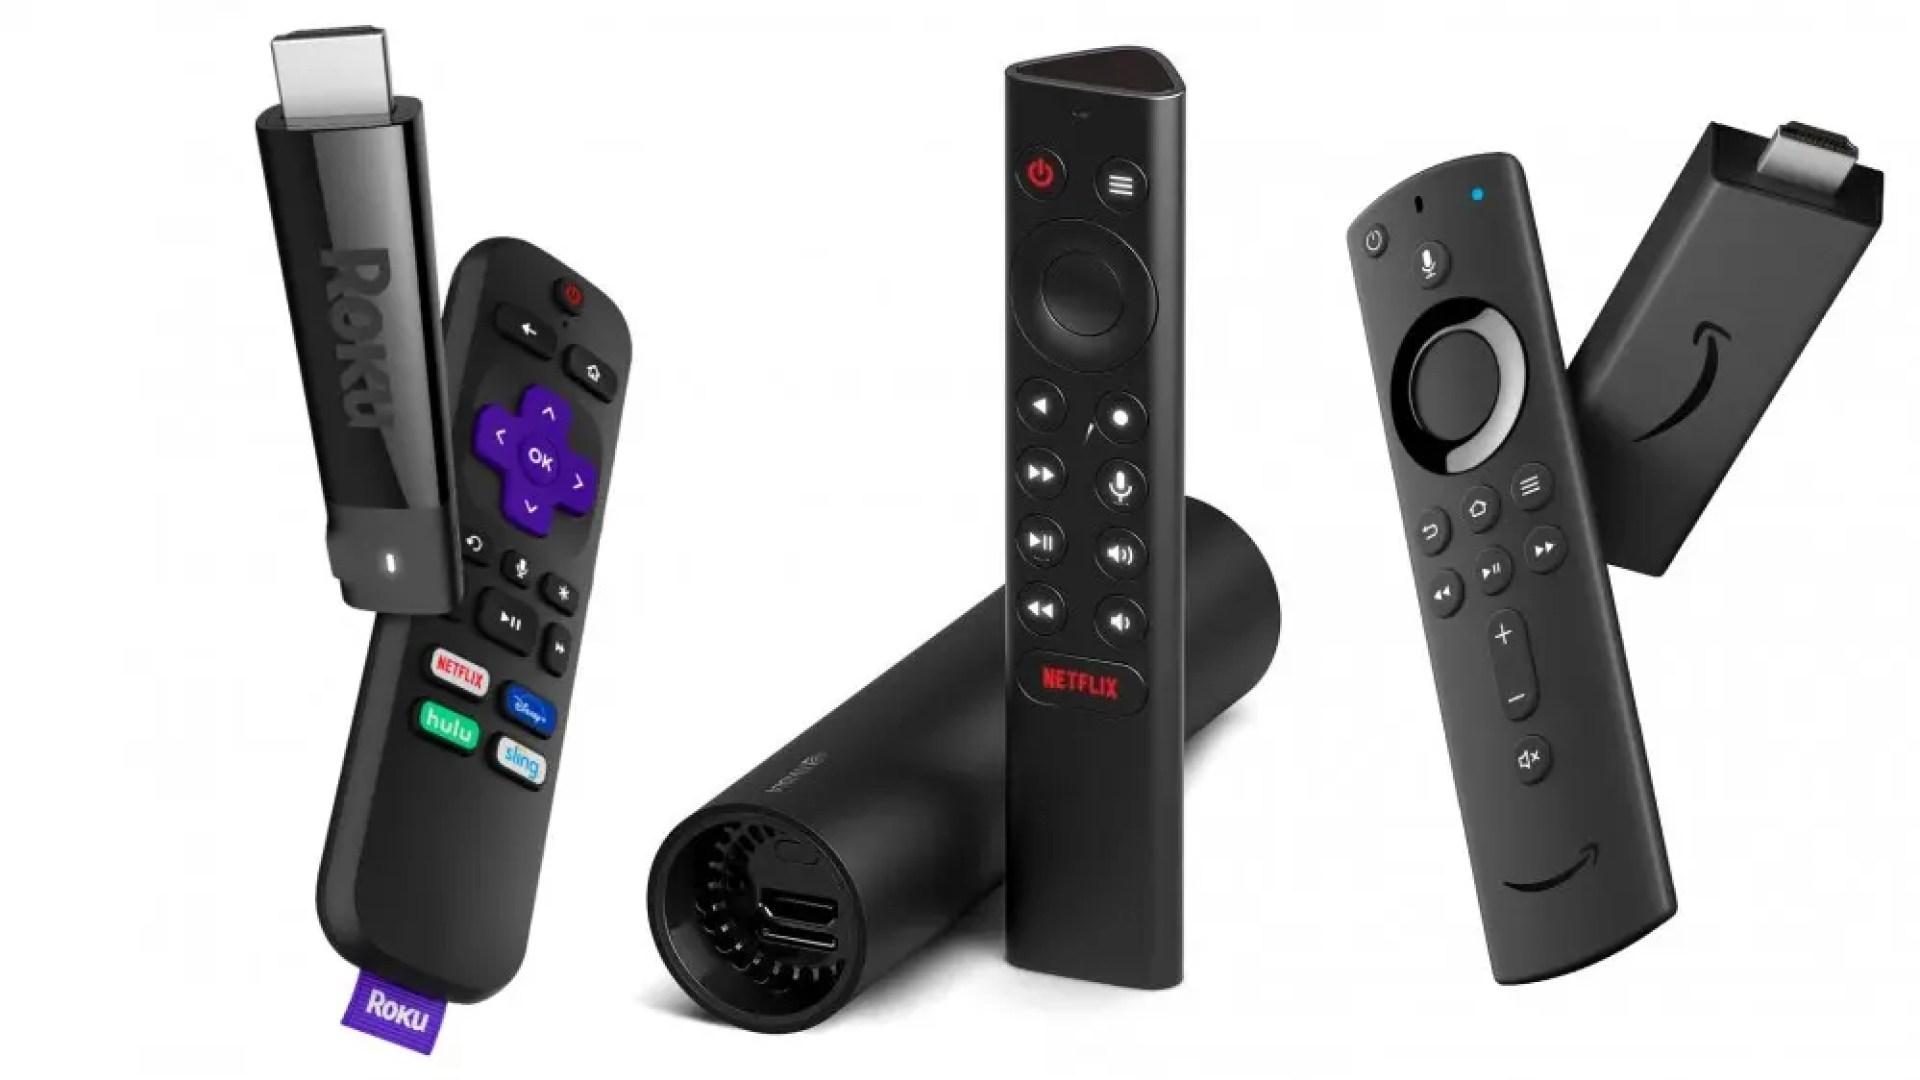 A photo of the Roku, NVIDIA Shield, and Amazon Firestick streaming sticks.